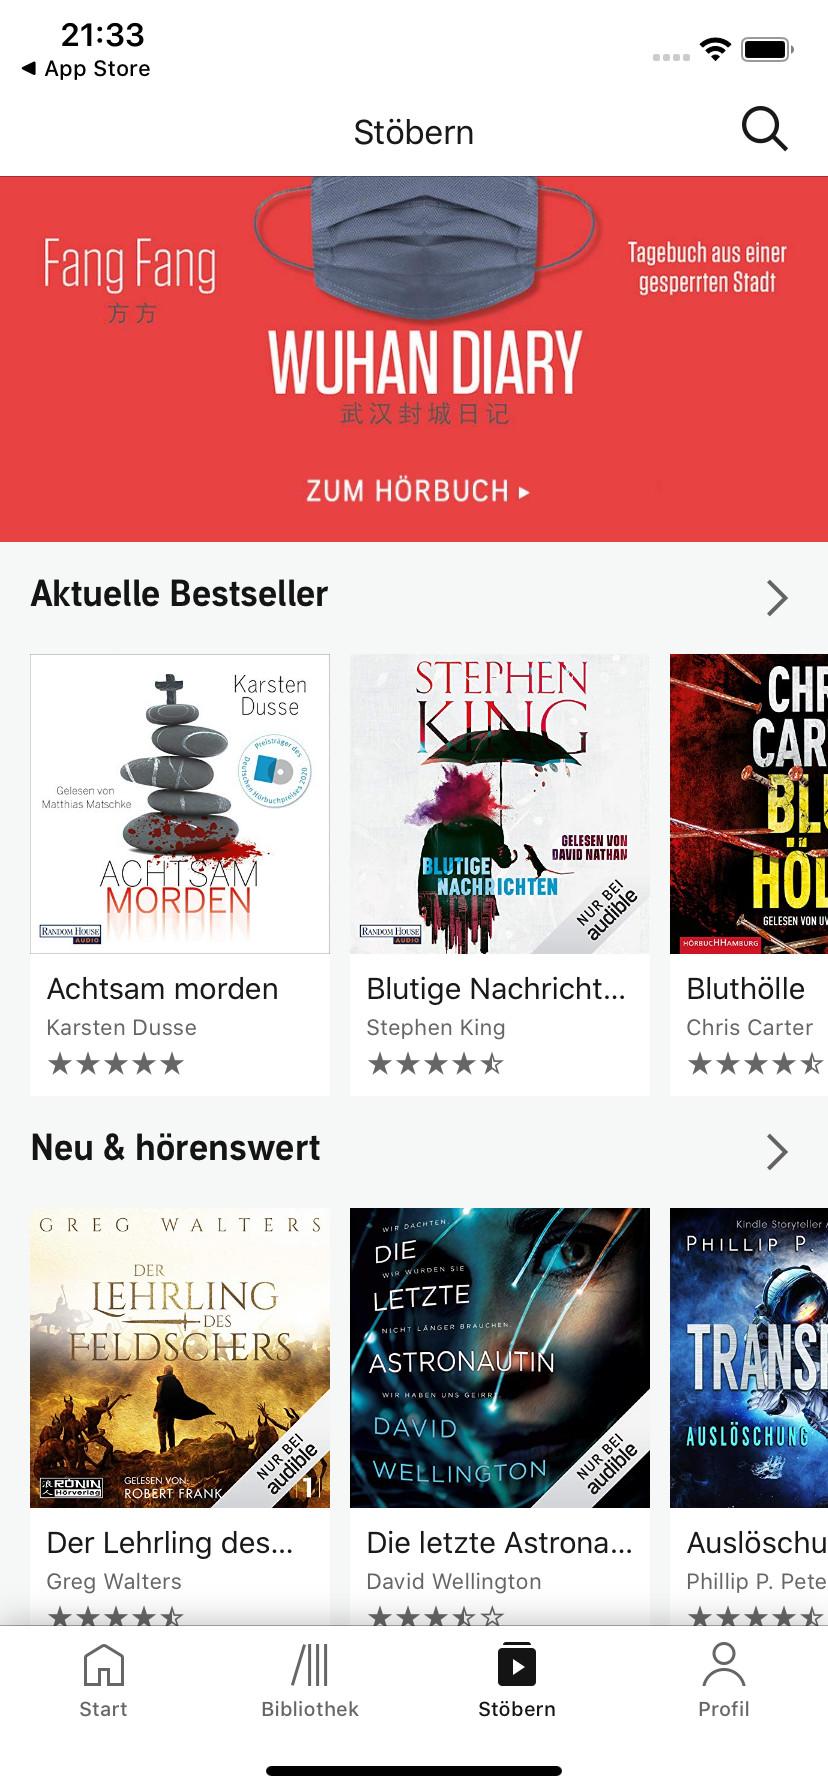 Screenshot 1 - Audible Hörbücher & Podcasts (App für iPhone & iPad)